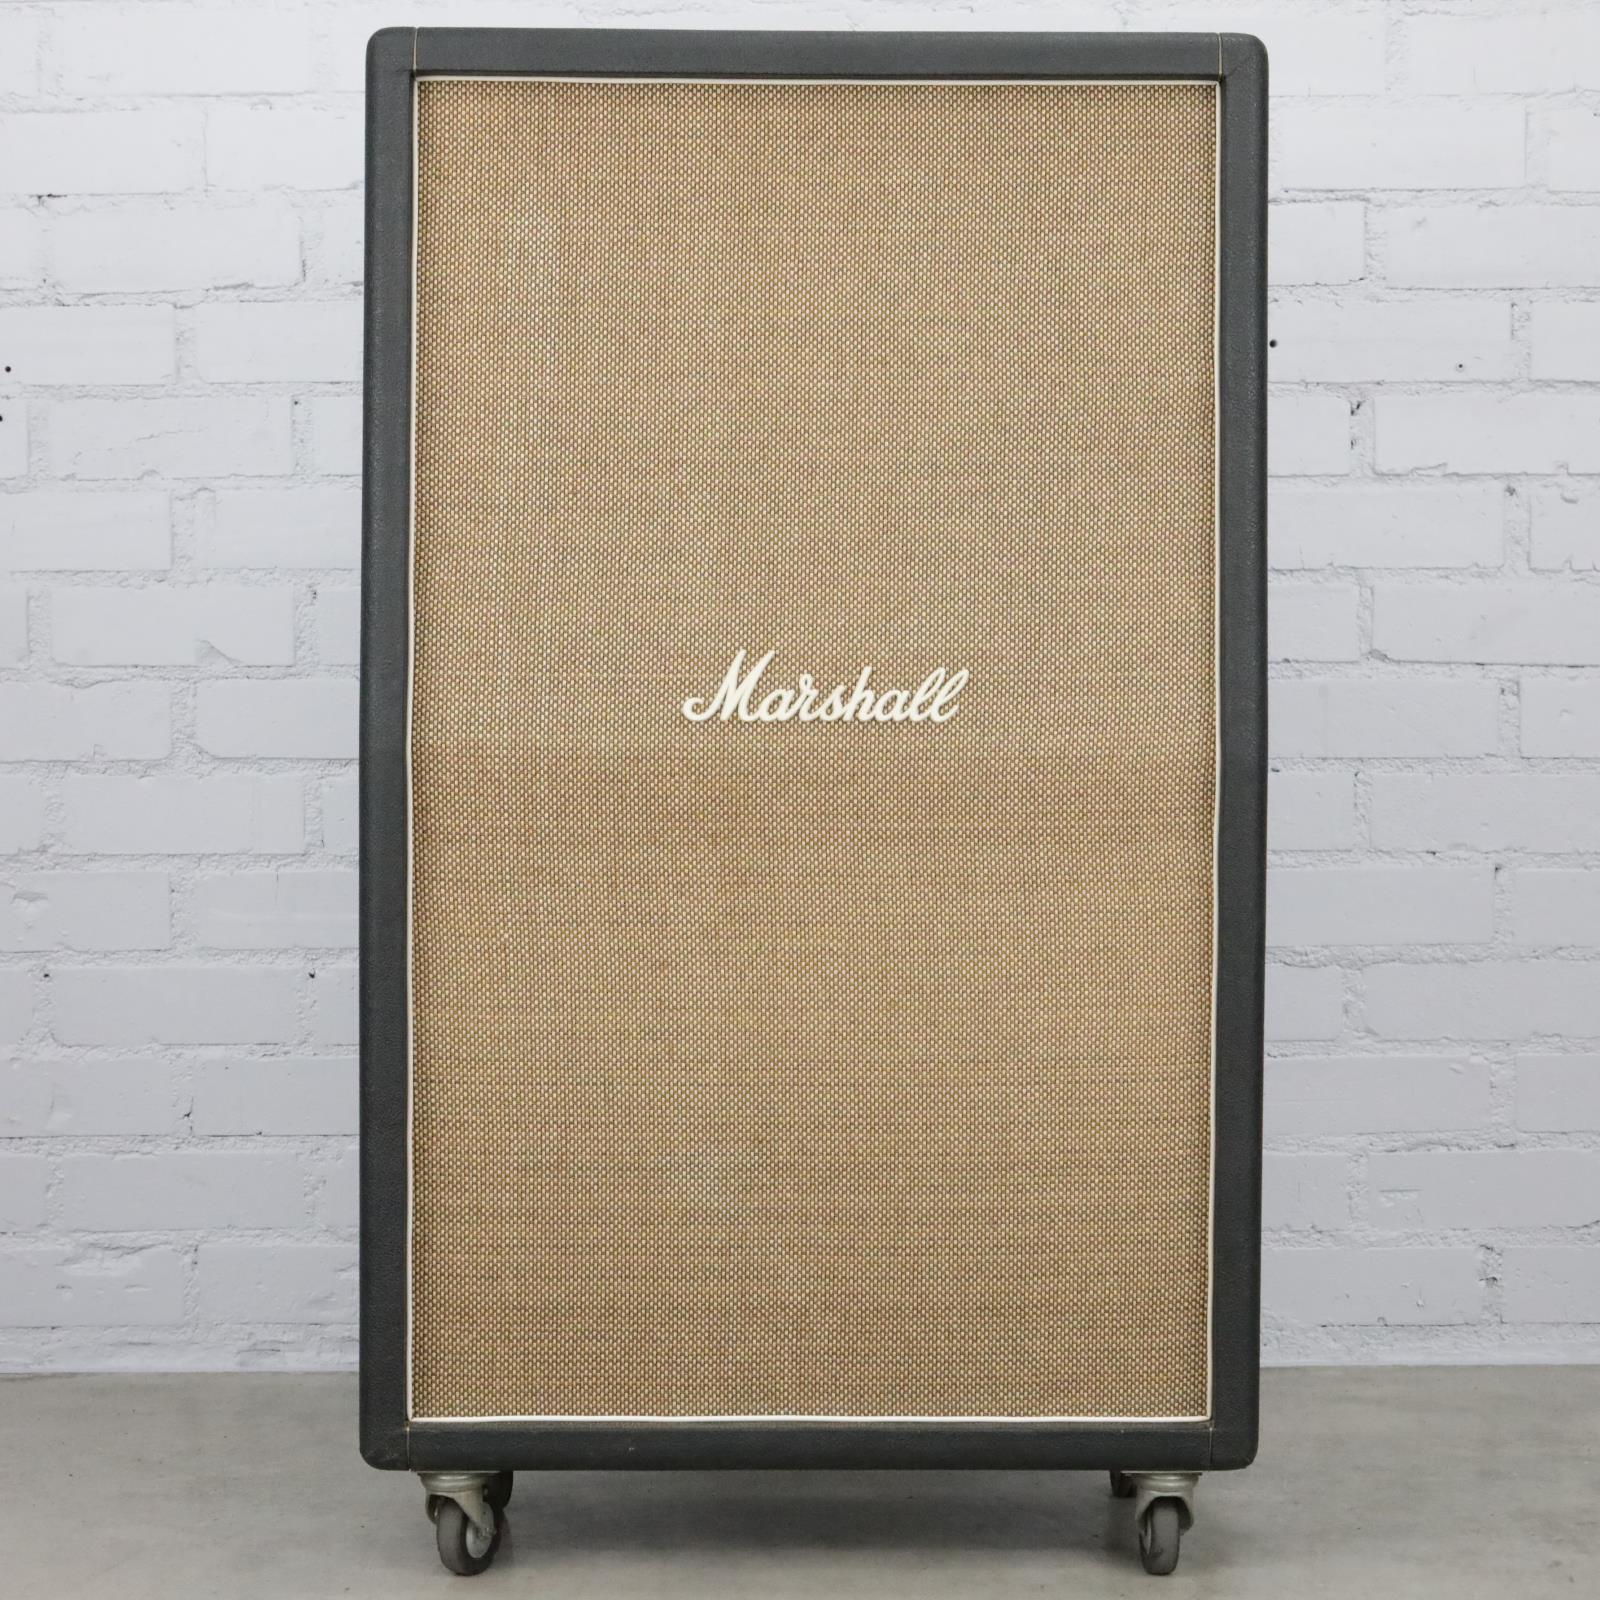 1970 Marshall 2034 8x10 High-Power Basketweave Cabinet Celestion 9384 #40454